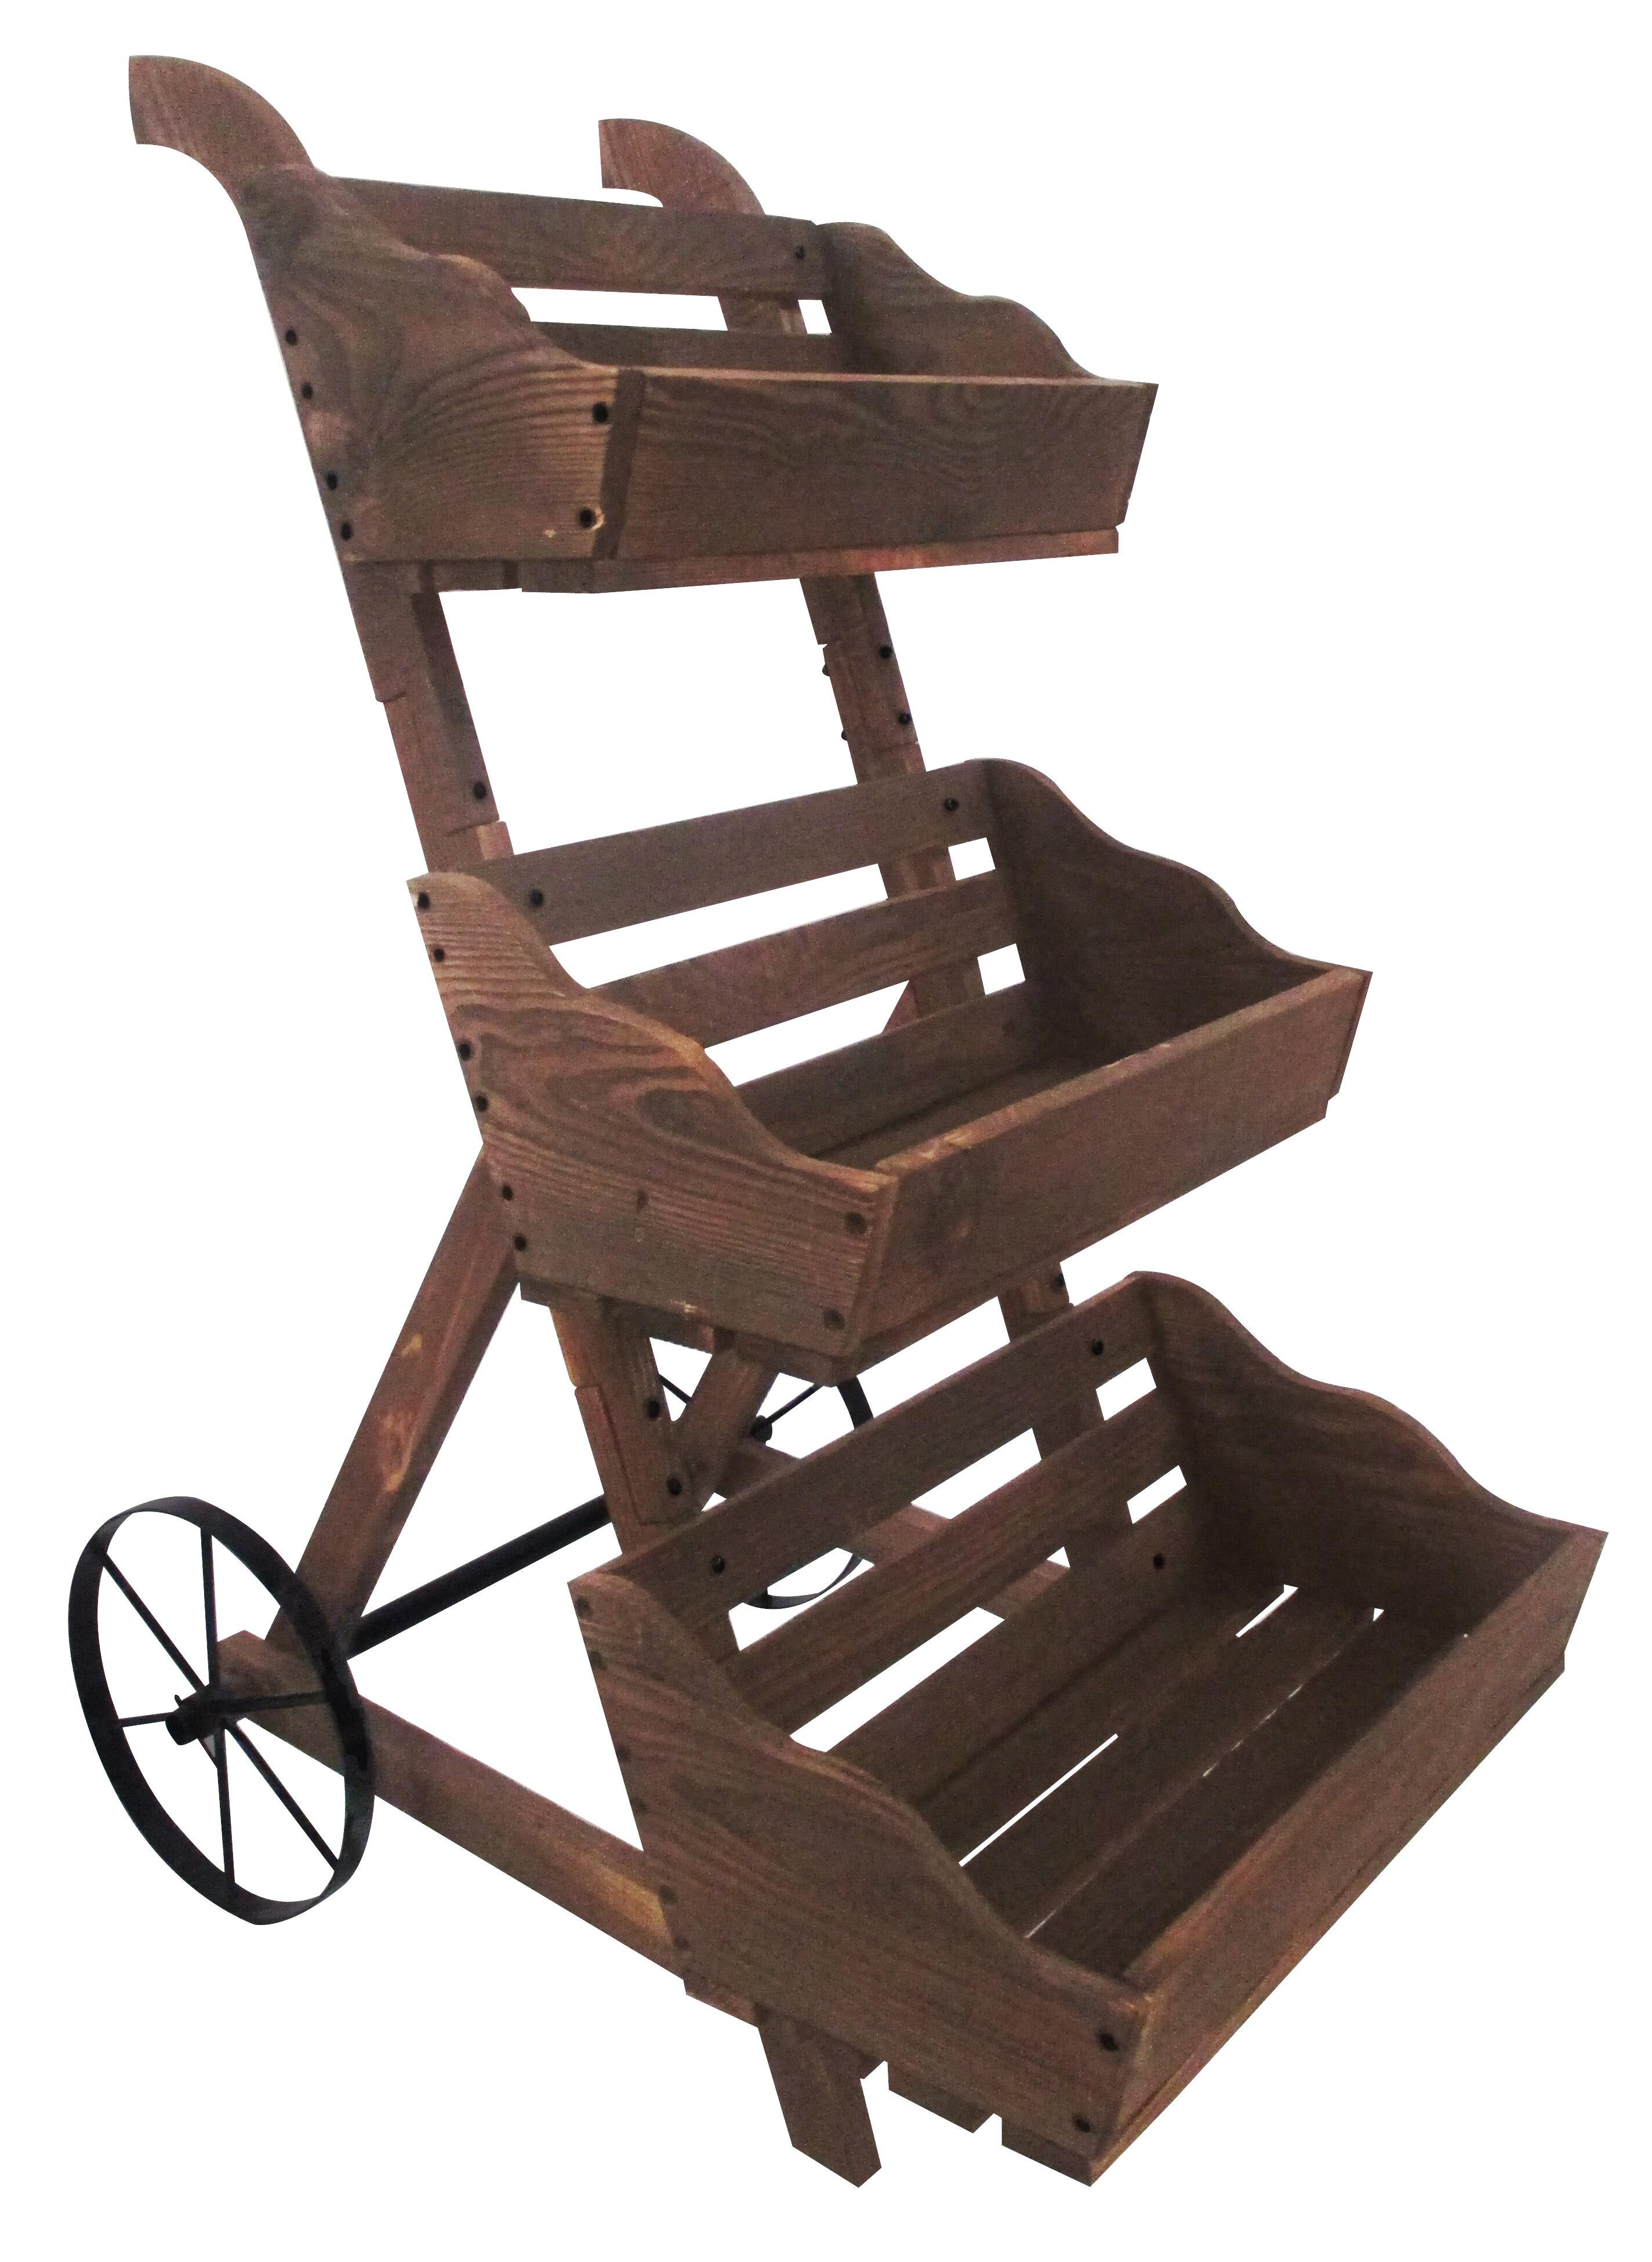 Charred 3 Tiered Wood Wheelbarrow Planter Reviews Joss Main